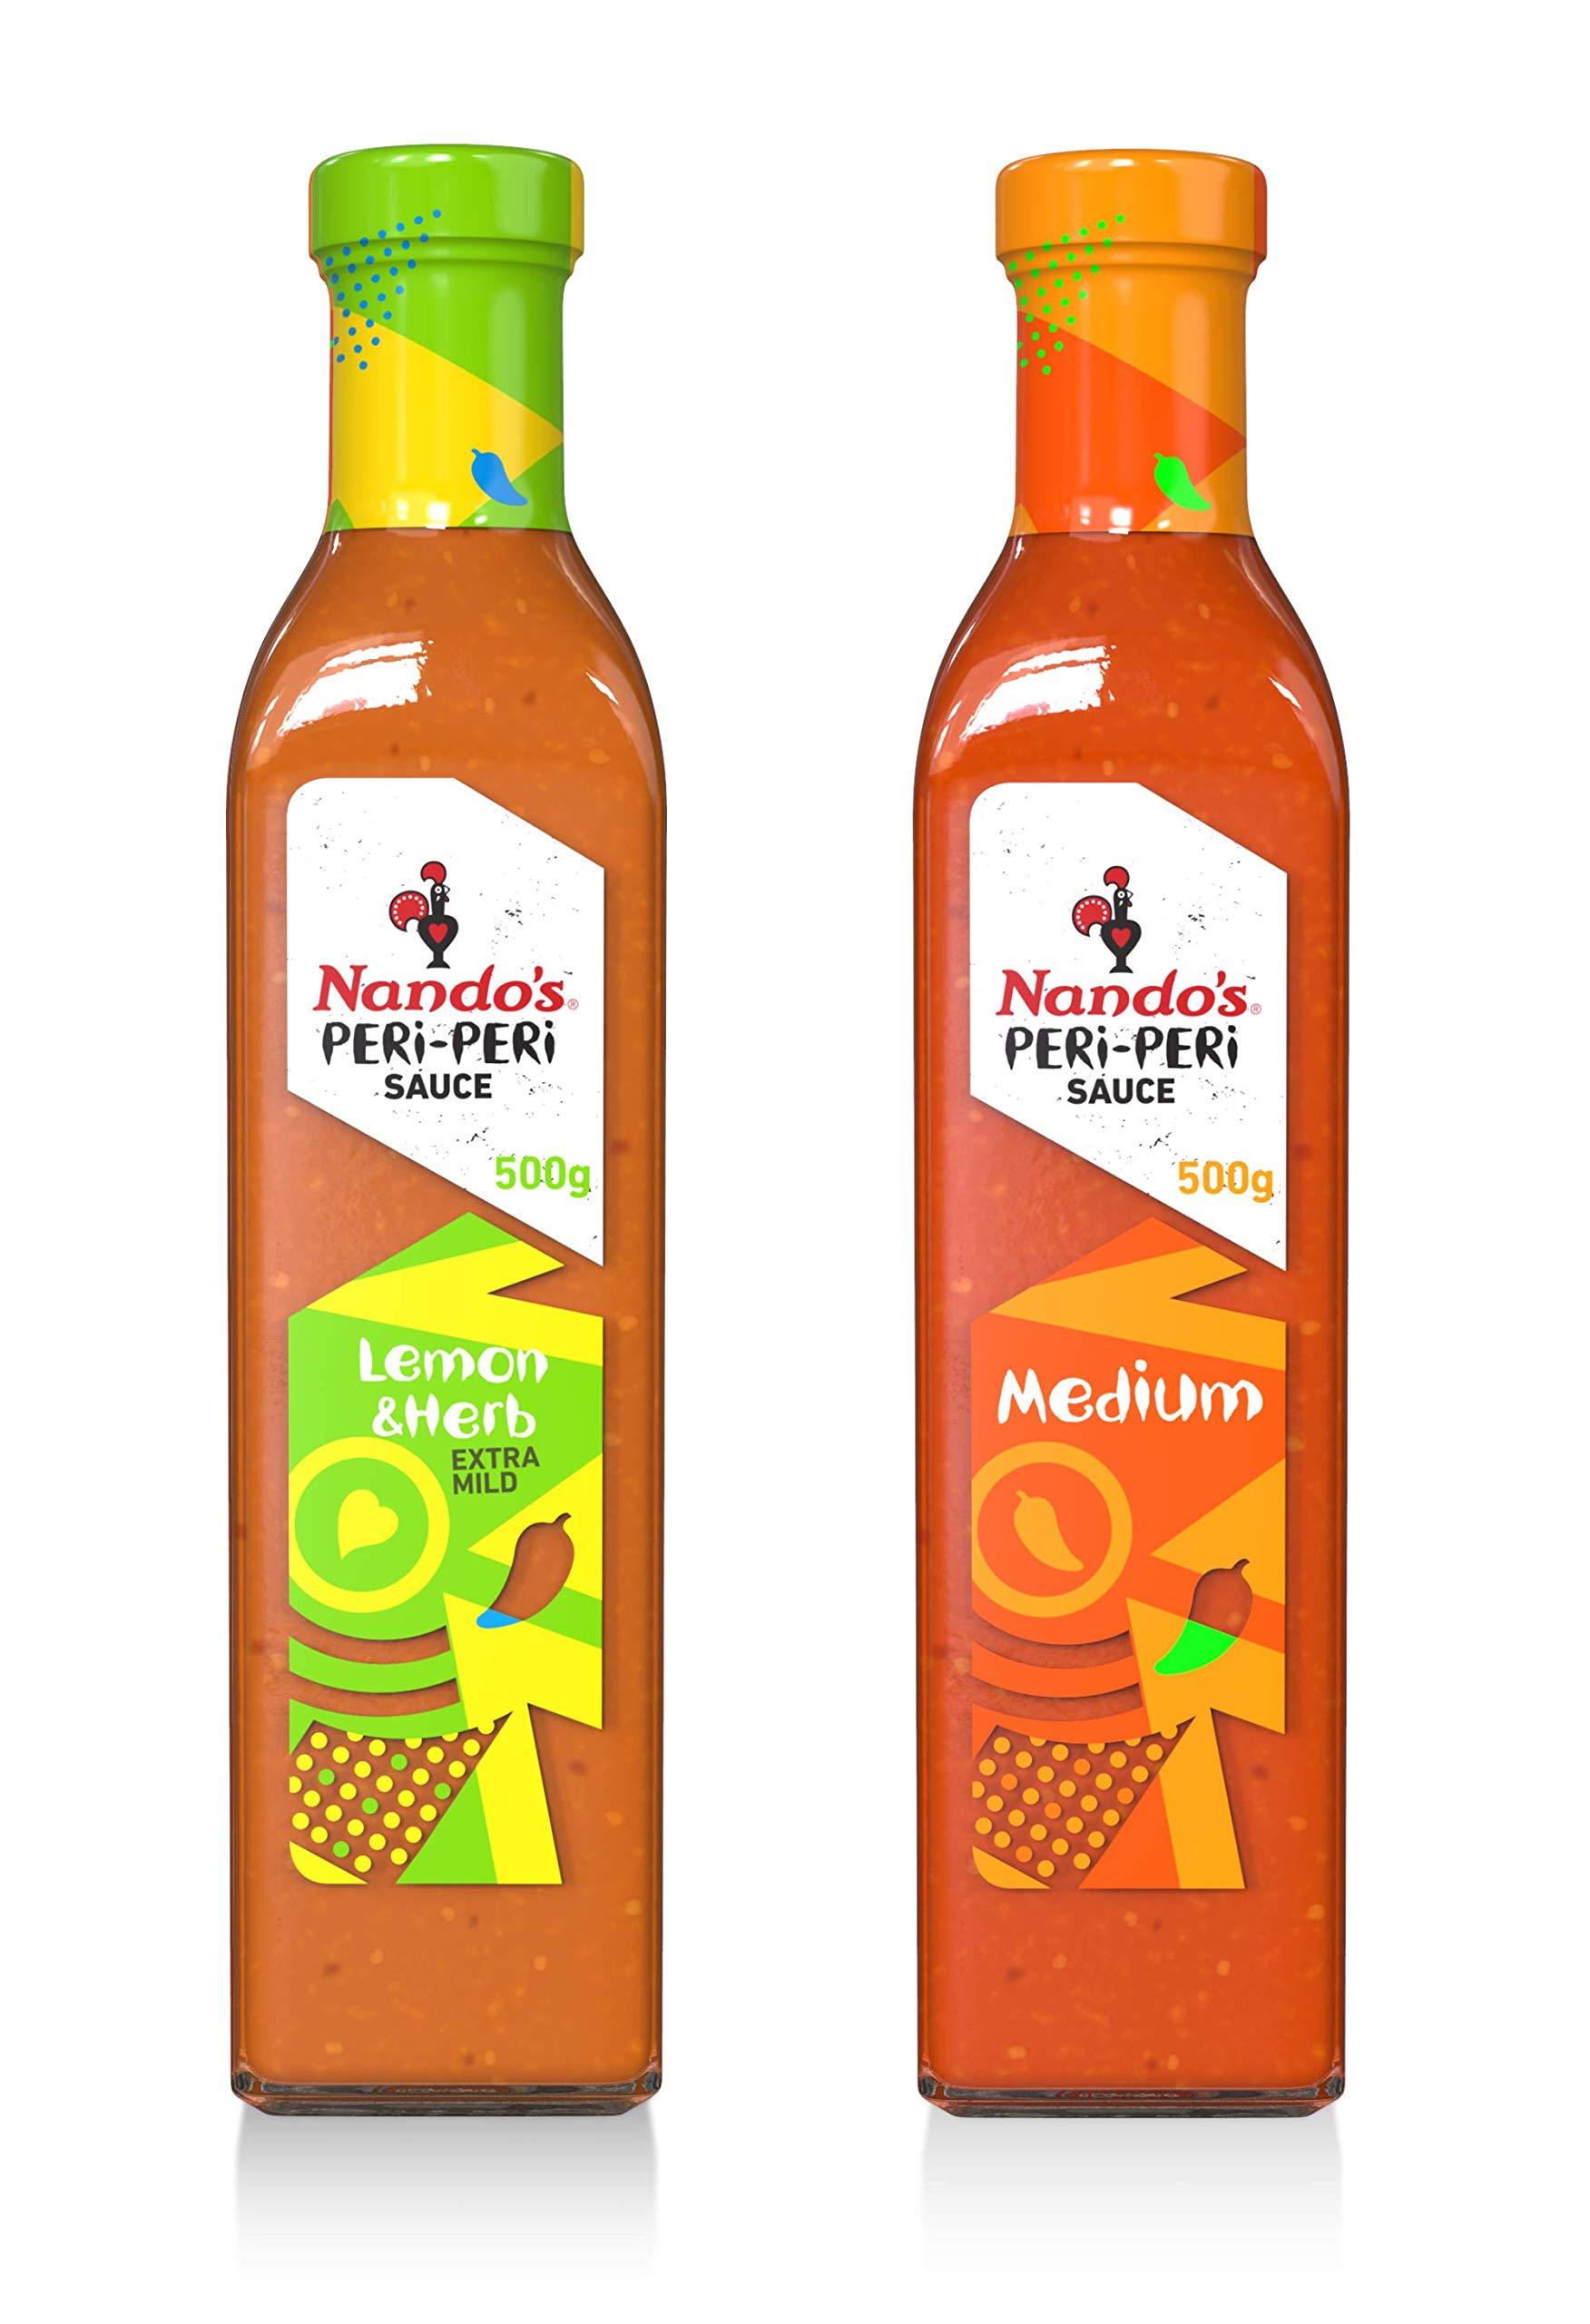 Nando's PERi-PERi Sauce Zesty Variety Pack - Medium Hot Sauce and Lemon & Herb Sauce | Gluten Free | Non-GMO - 17.6oz Bottle (2 Pack)